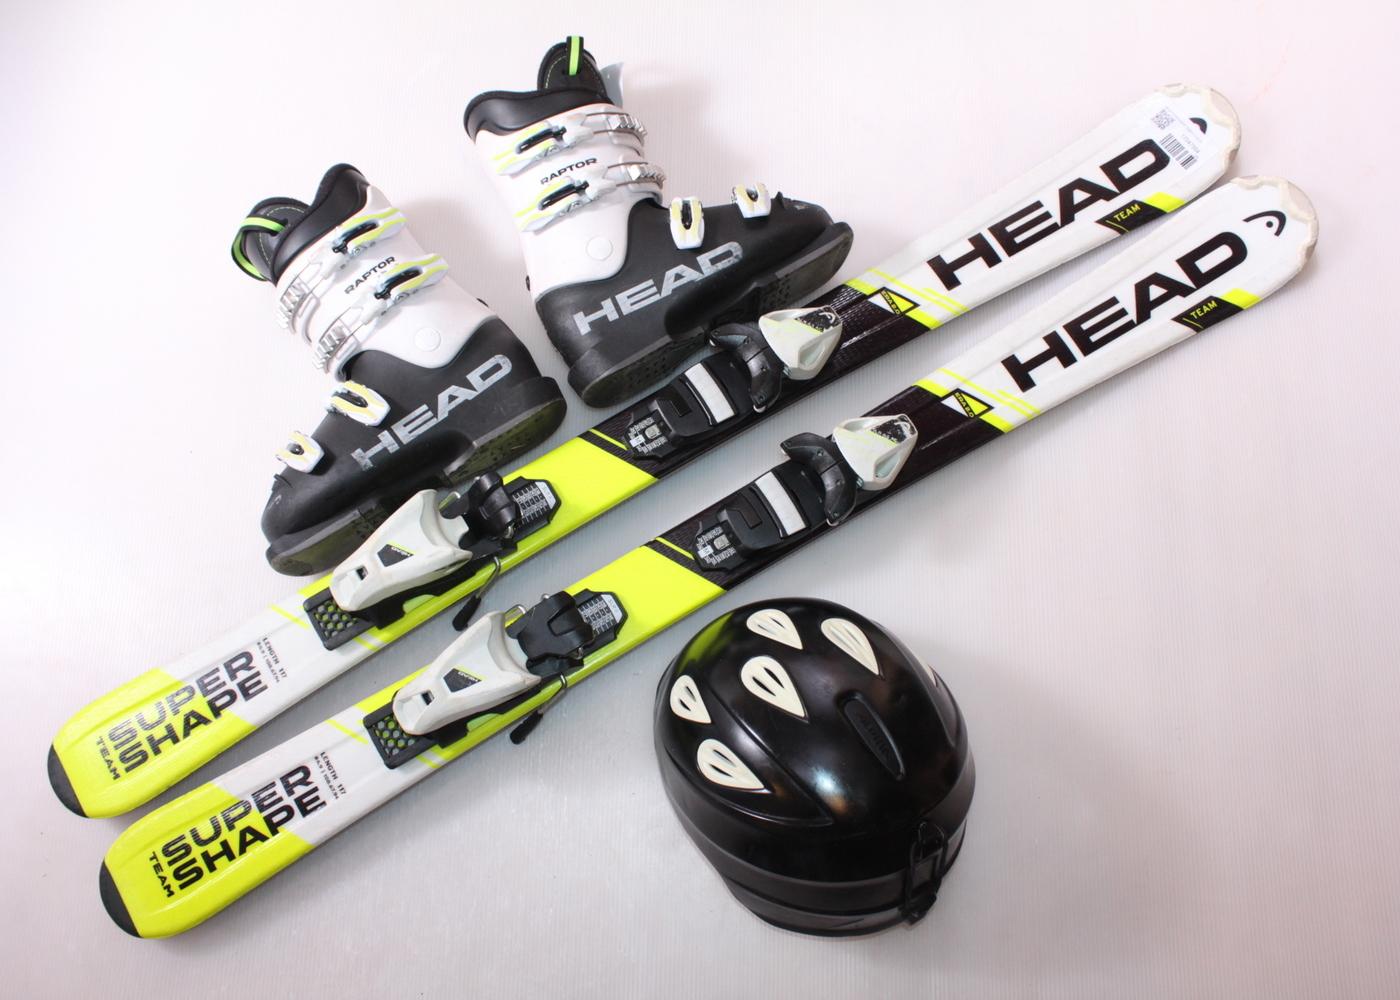 Dětské lyže HEAD SUPERSHAPE TEAM 117 cm + lyžáky  36EU + helma